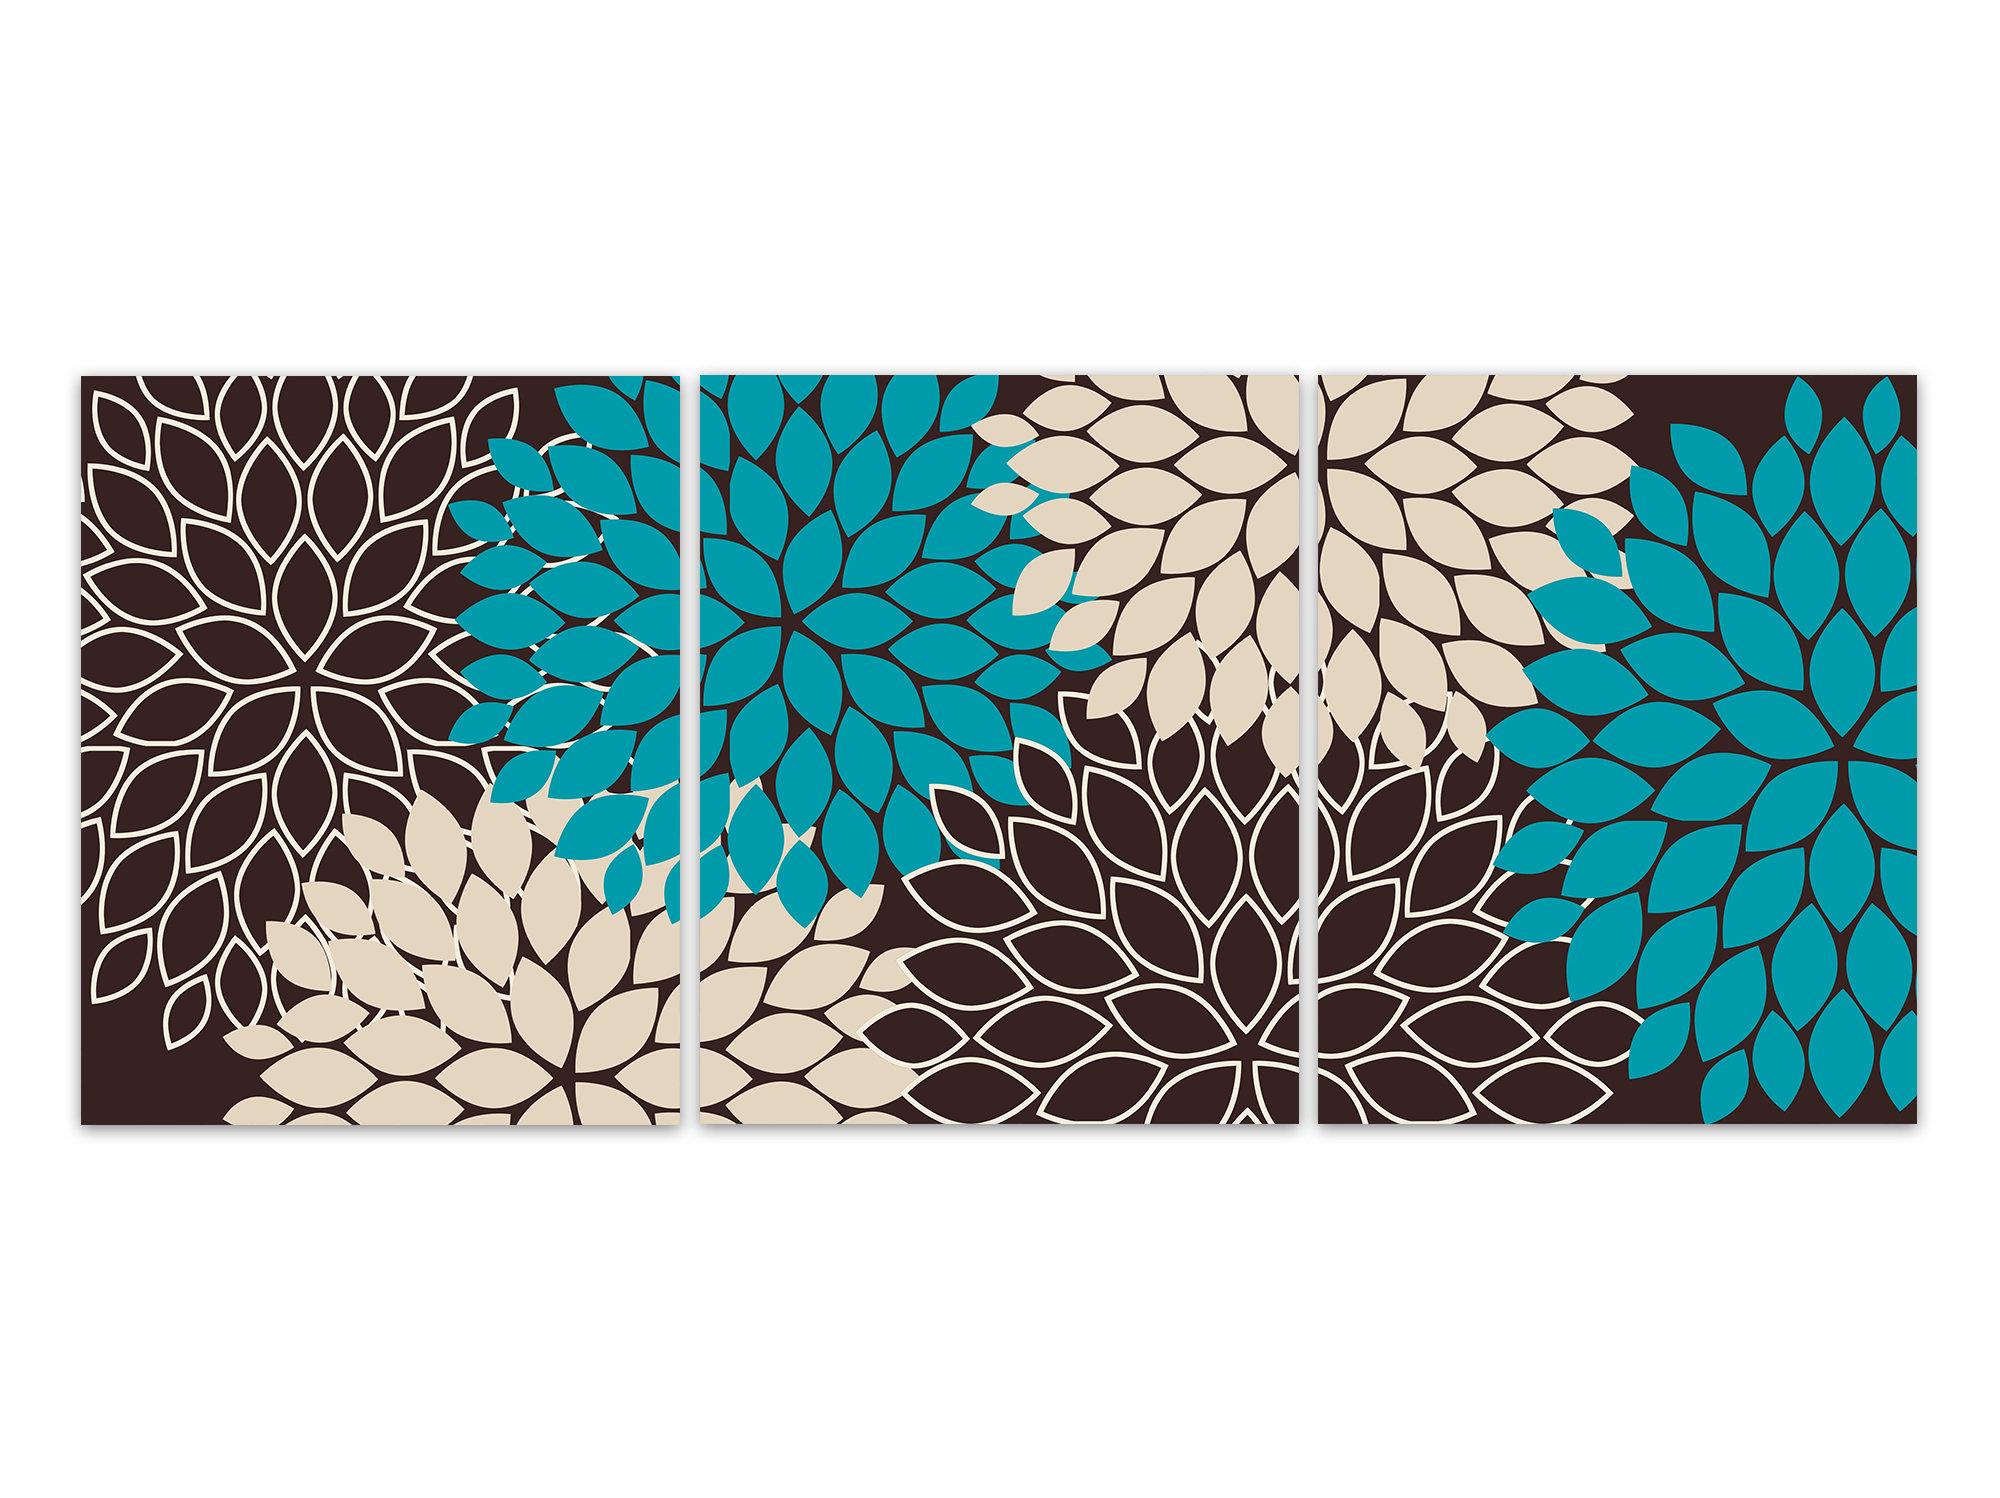 Home Decor Wall Art Prints or Canvas, Teal Brown Tan Flower ...